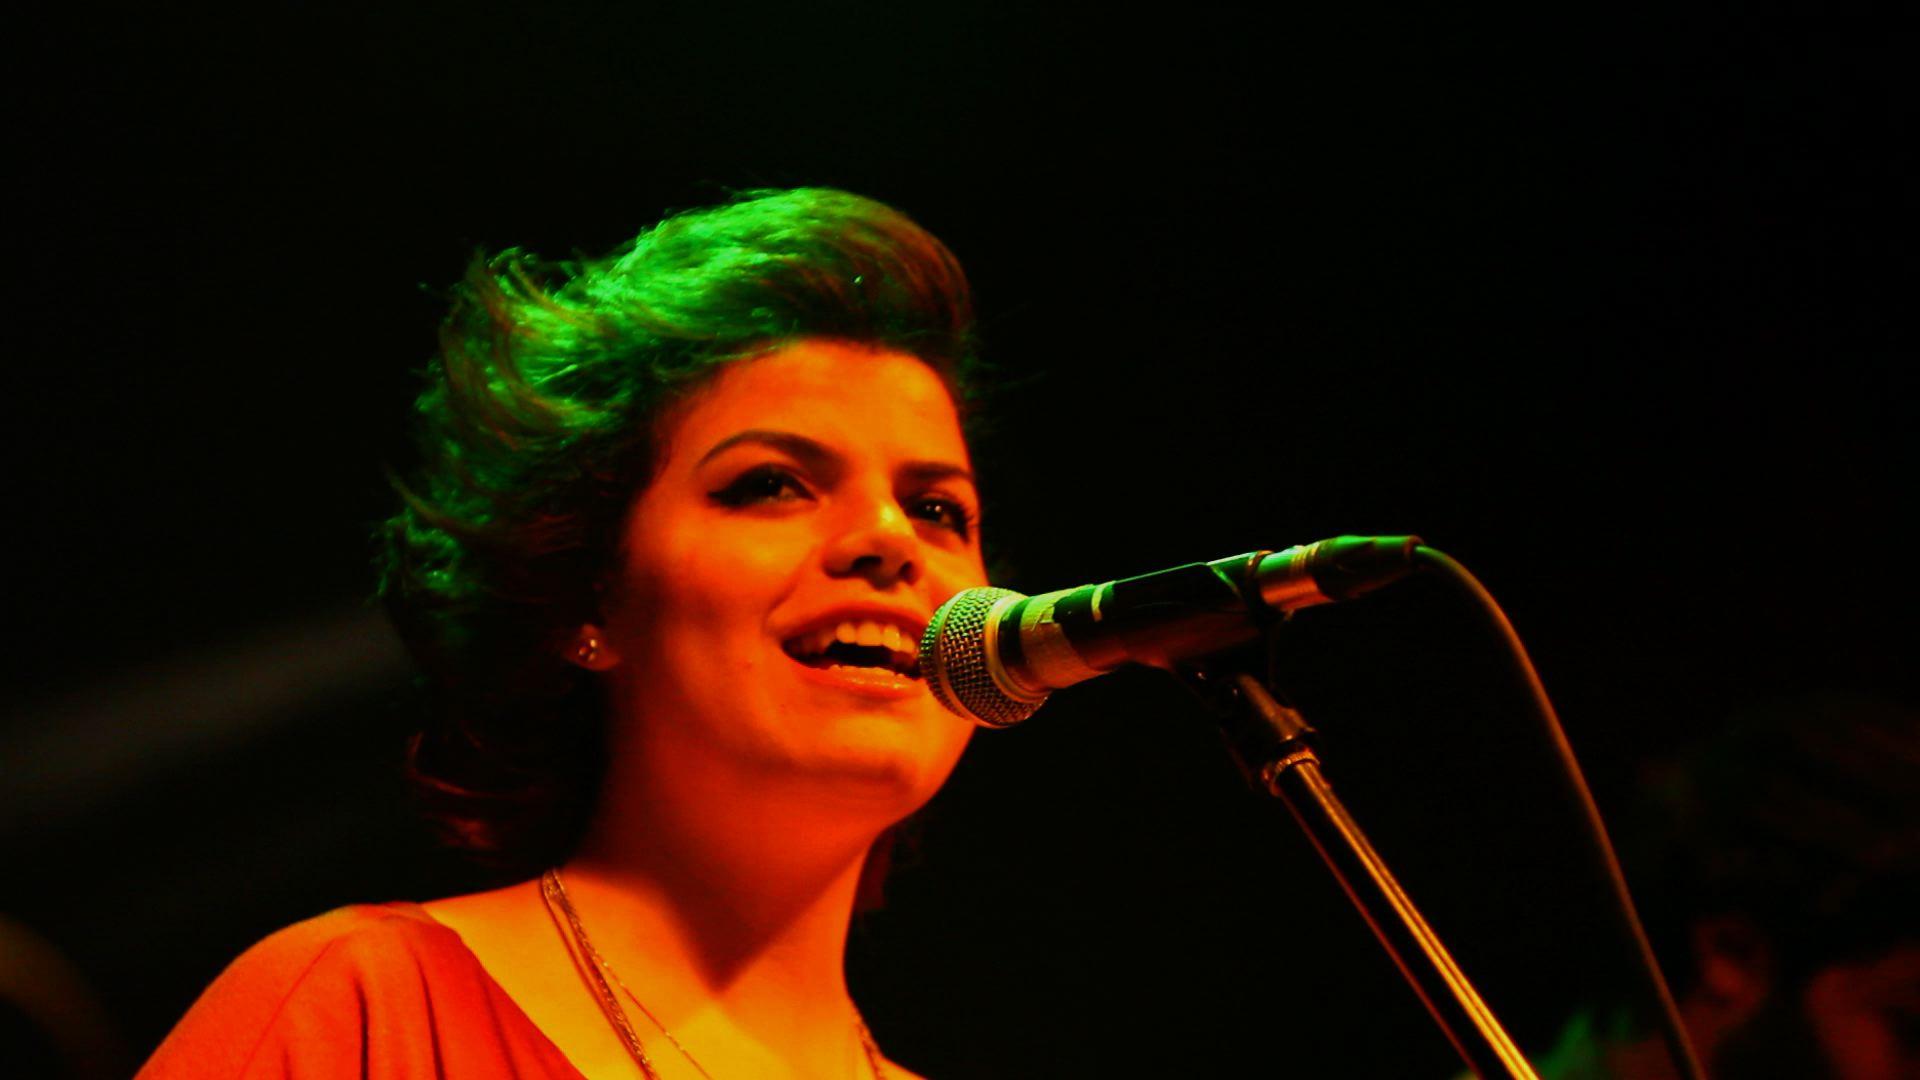 How Egyptian singer Sarah El Gohary found her voice - CNN Video